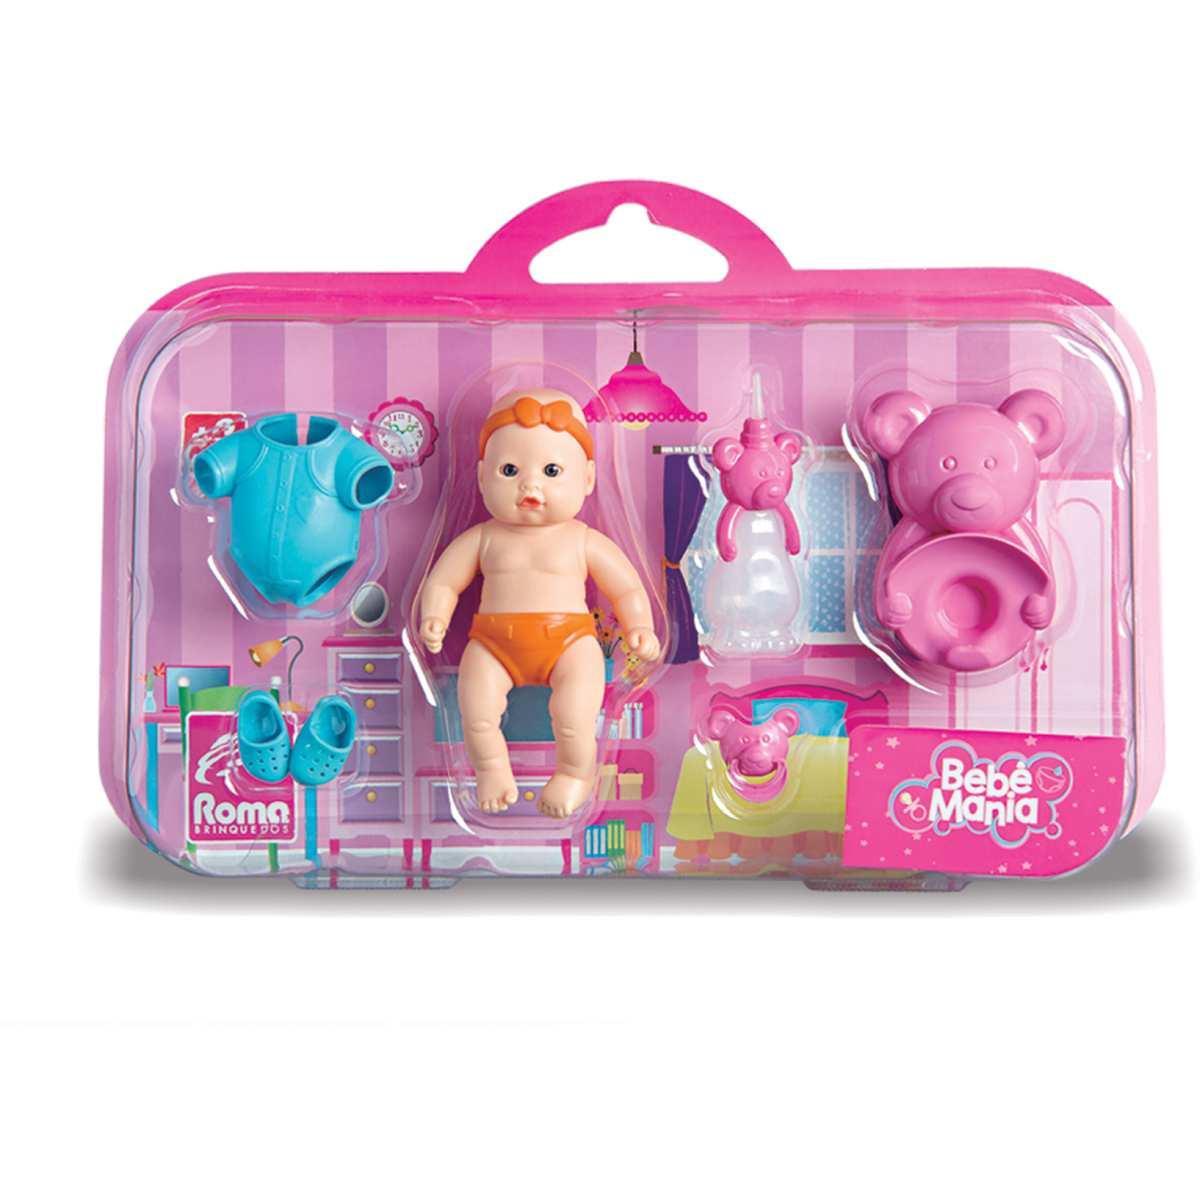 Boneca | Bebe Mania Peniquinho c/Acesso | Roma